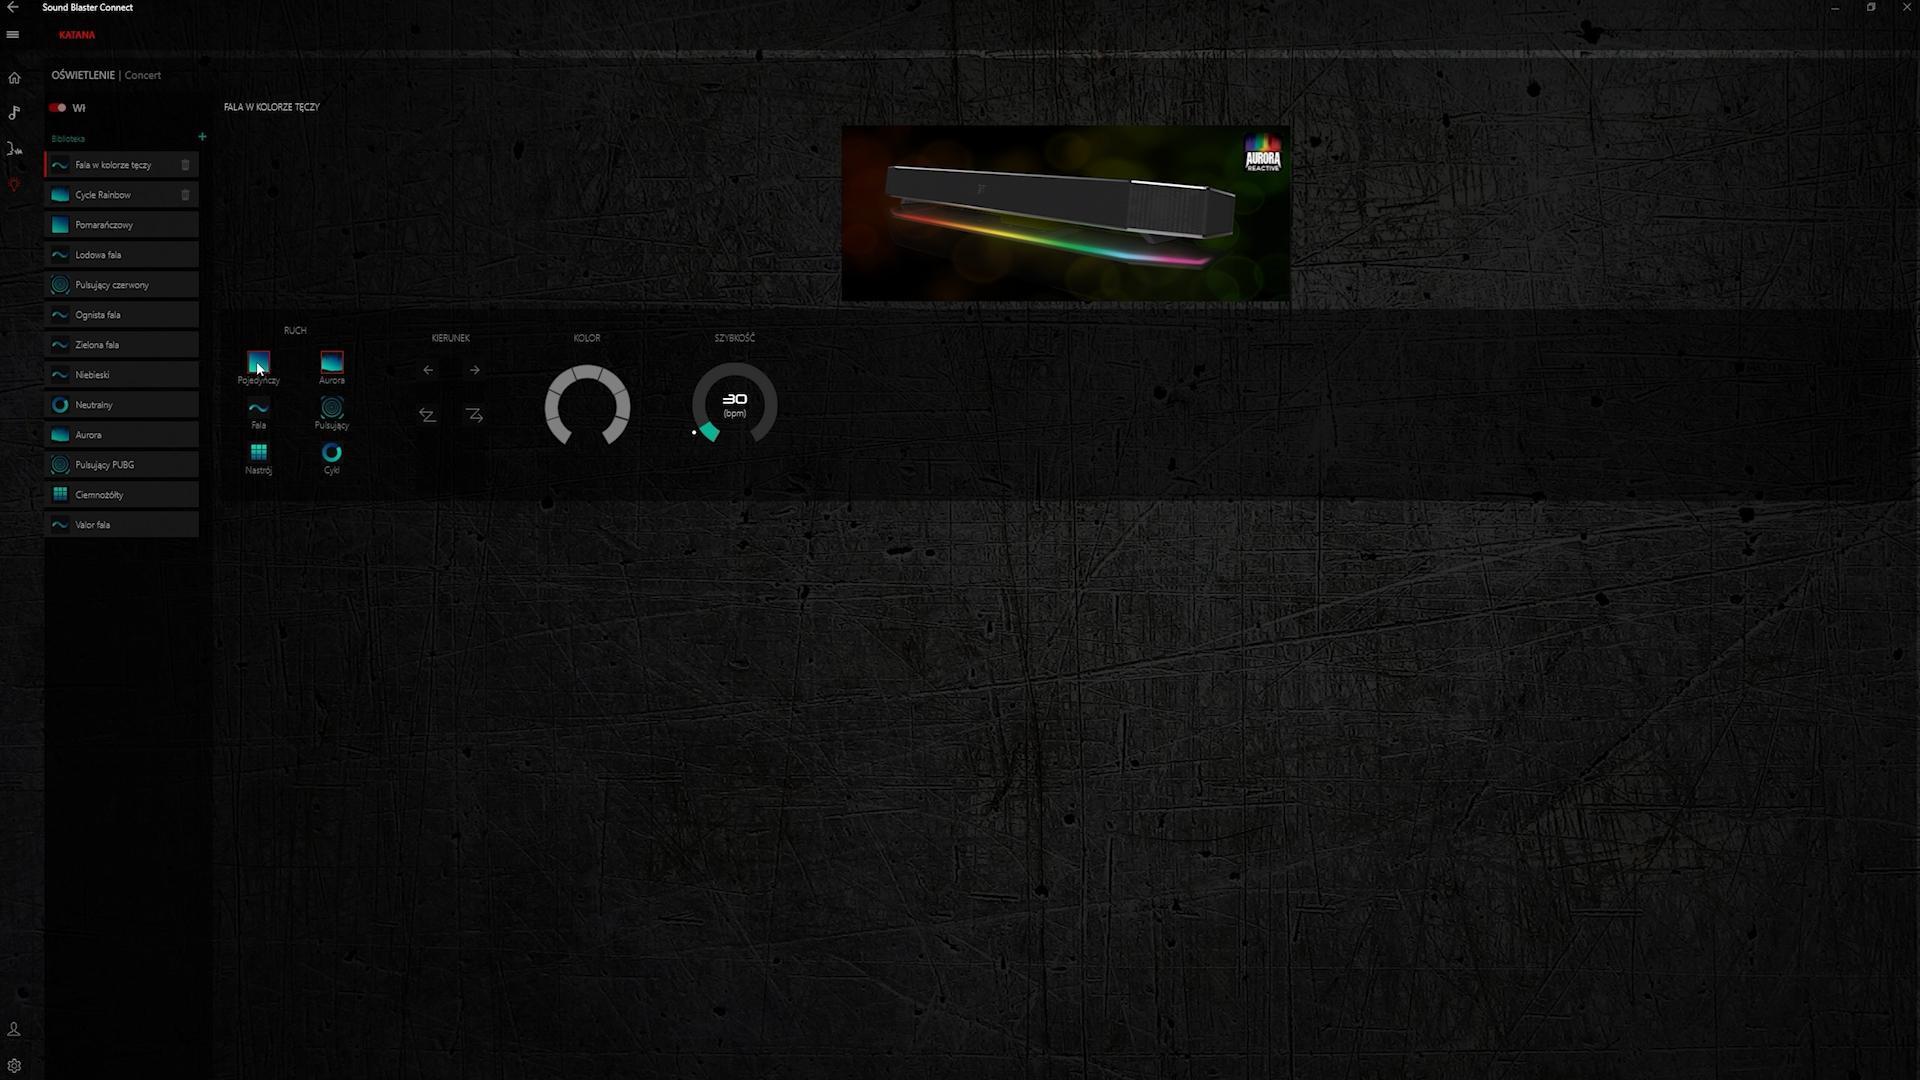 Creative Sound Blaster X Katana - najlepszy soundbar do grania! 28 Creative Sound Blaster X Katana